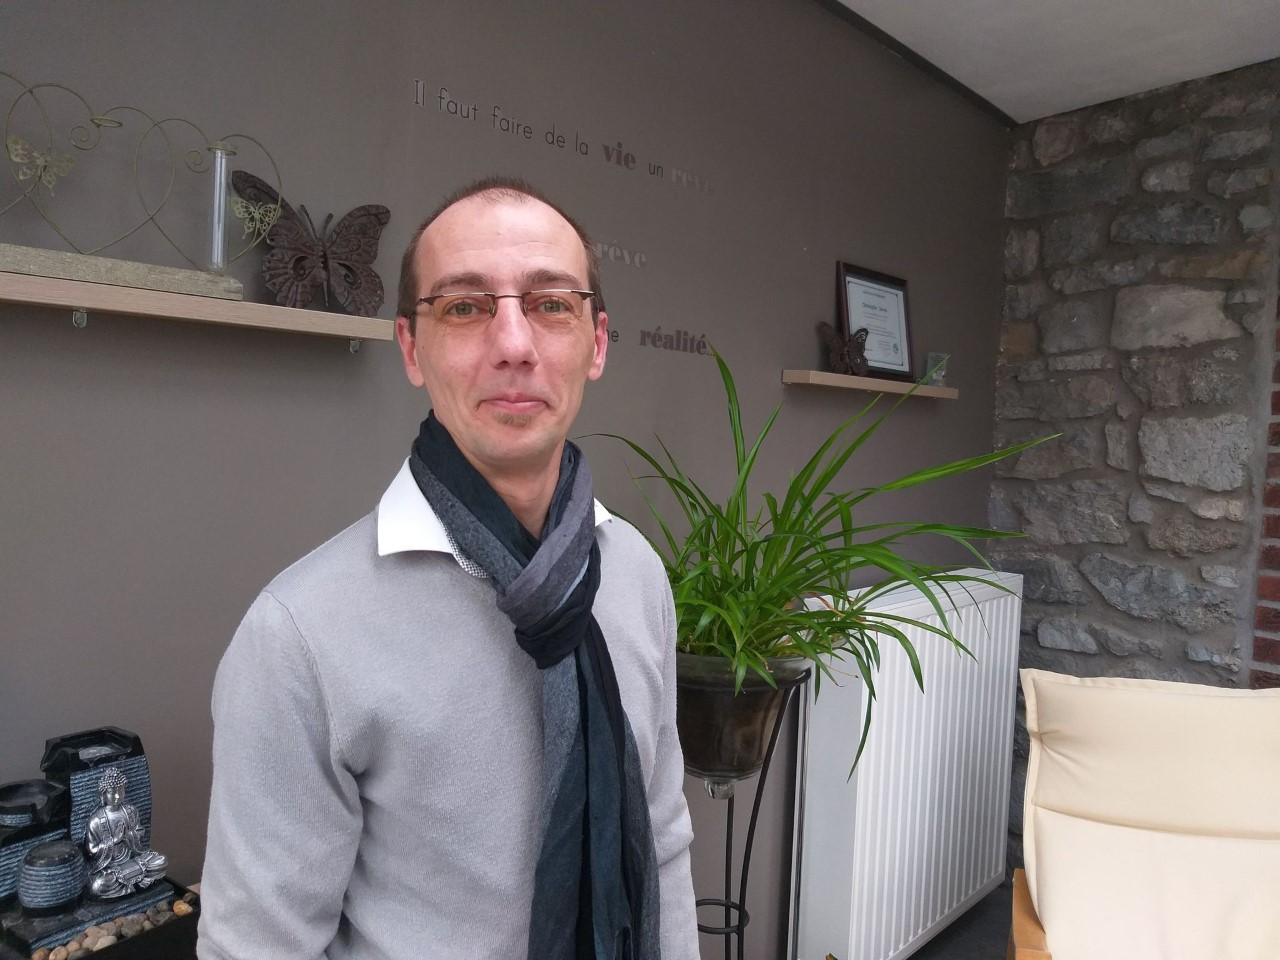 Christophe Devos - praticien EFT- Homeostasia Gerpinnes